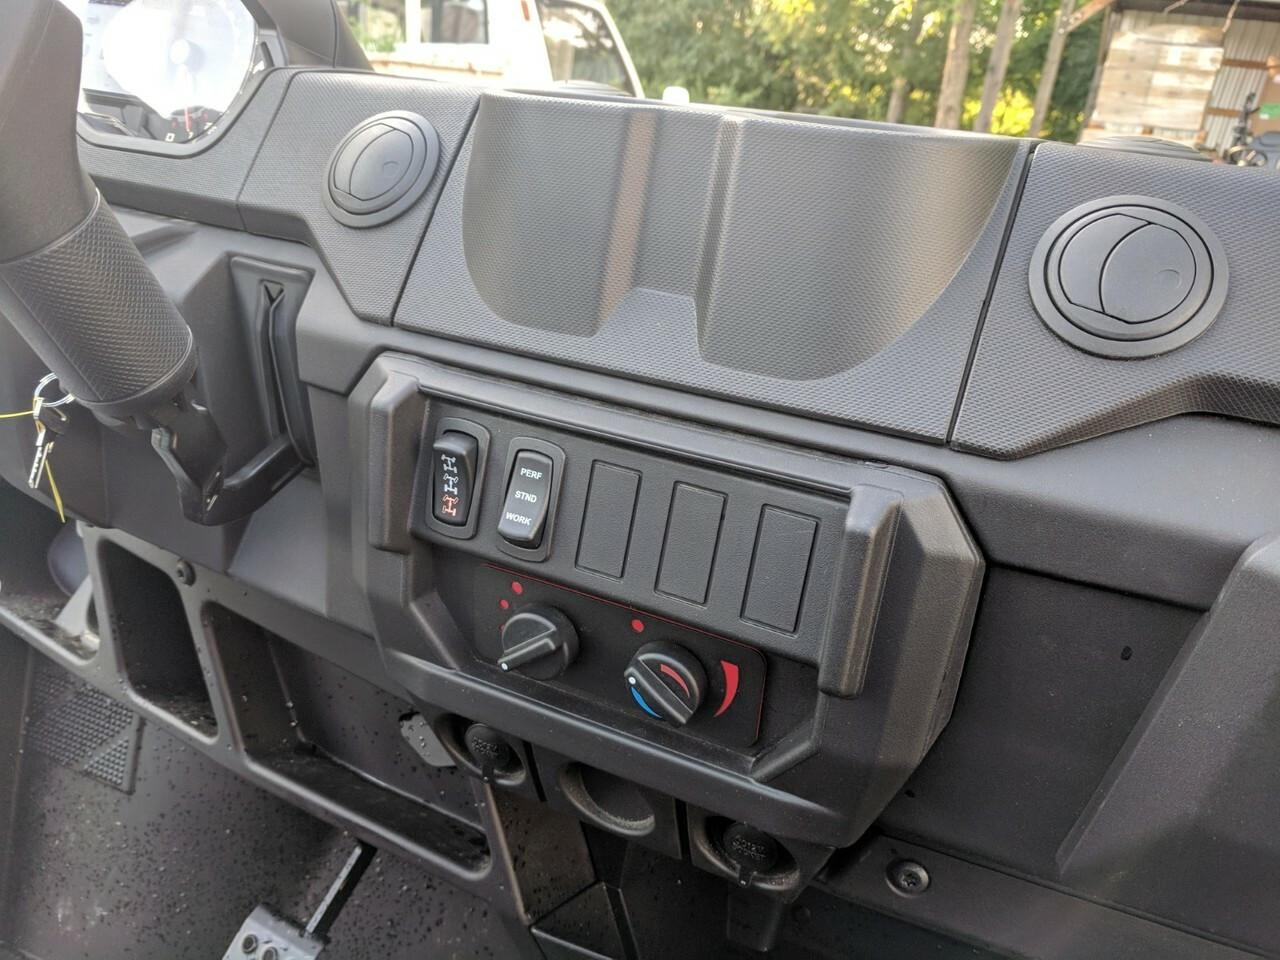 Ice Crusher Cab Heater Polaris Ranger 18+ XP1000 and Crew